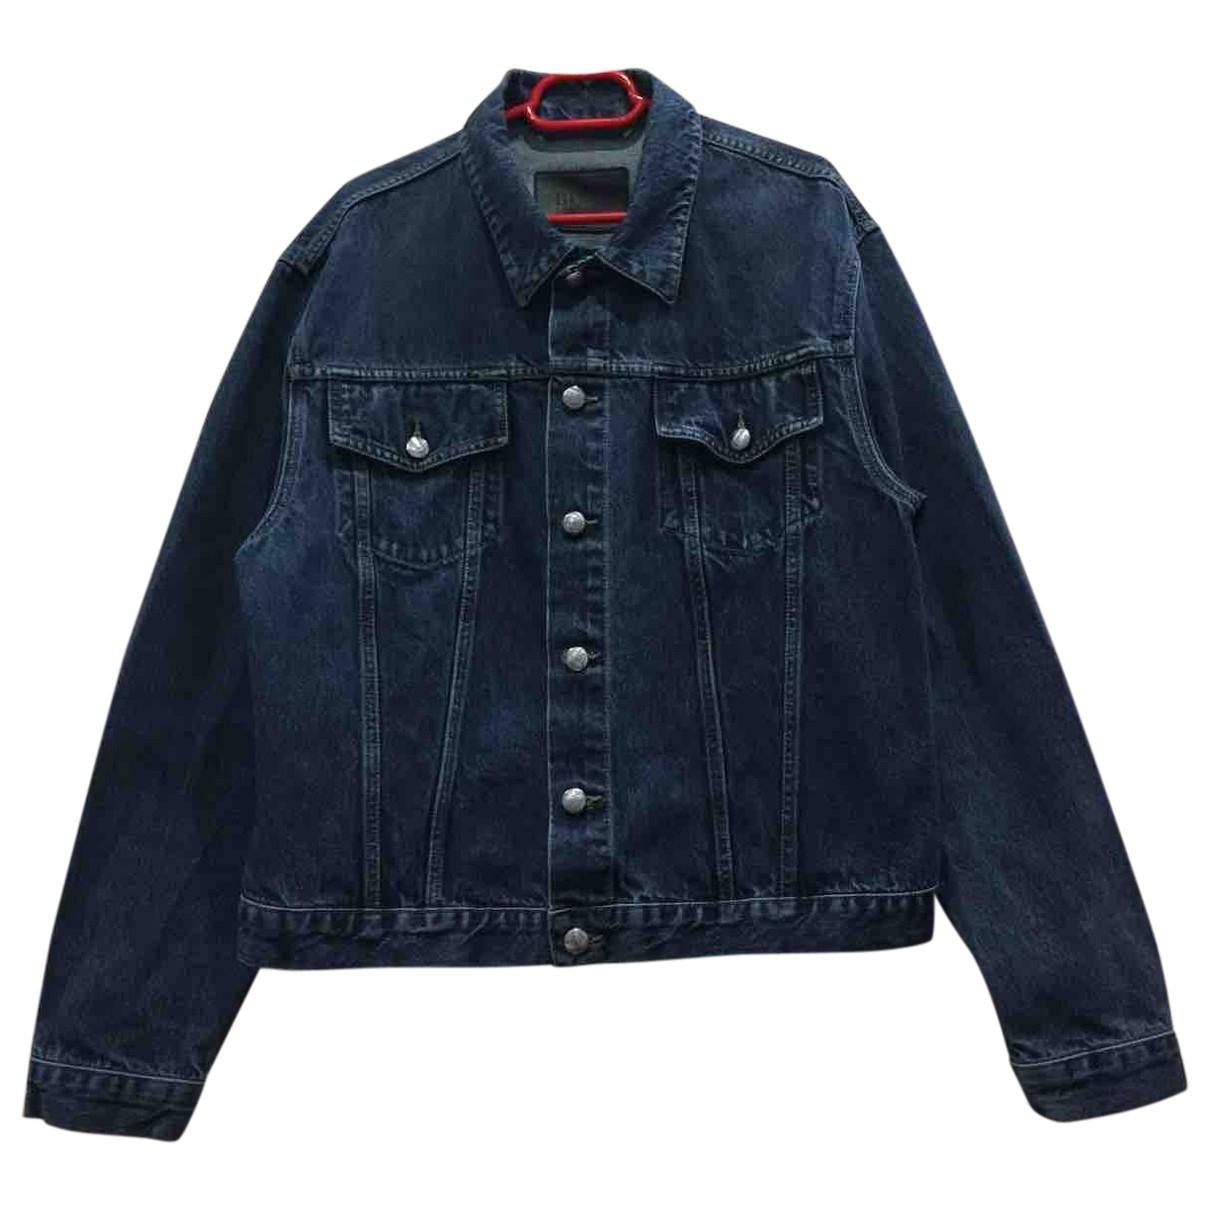 Boss \N Blue Denim - Jeans jacket  for Men 48 FR